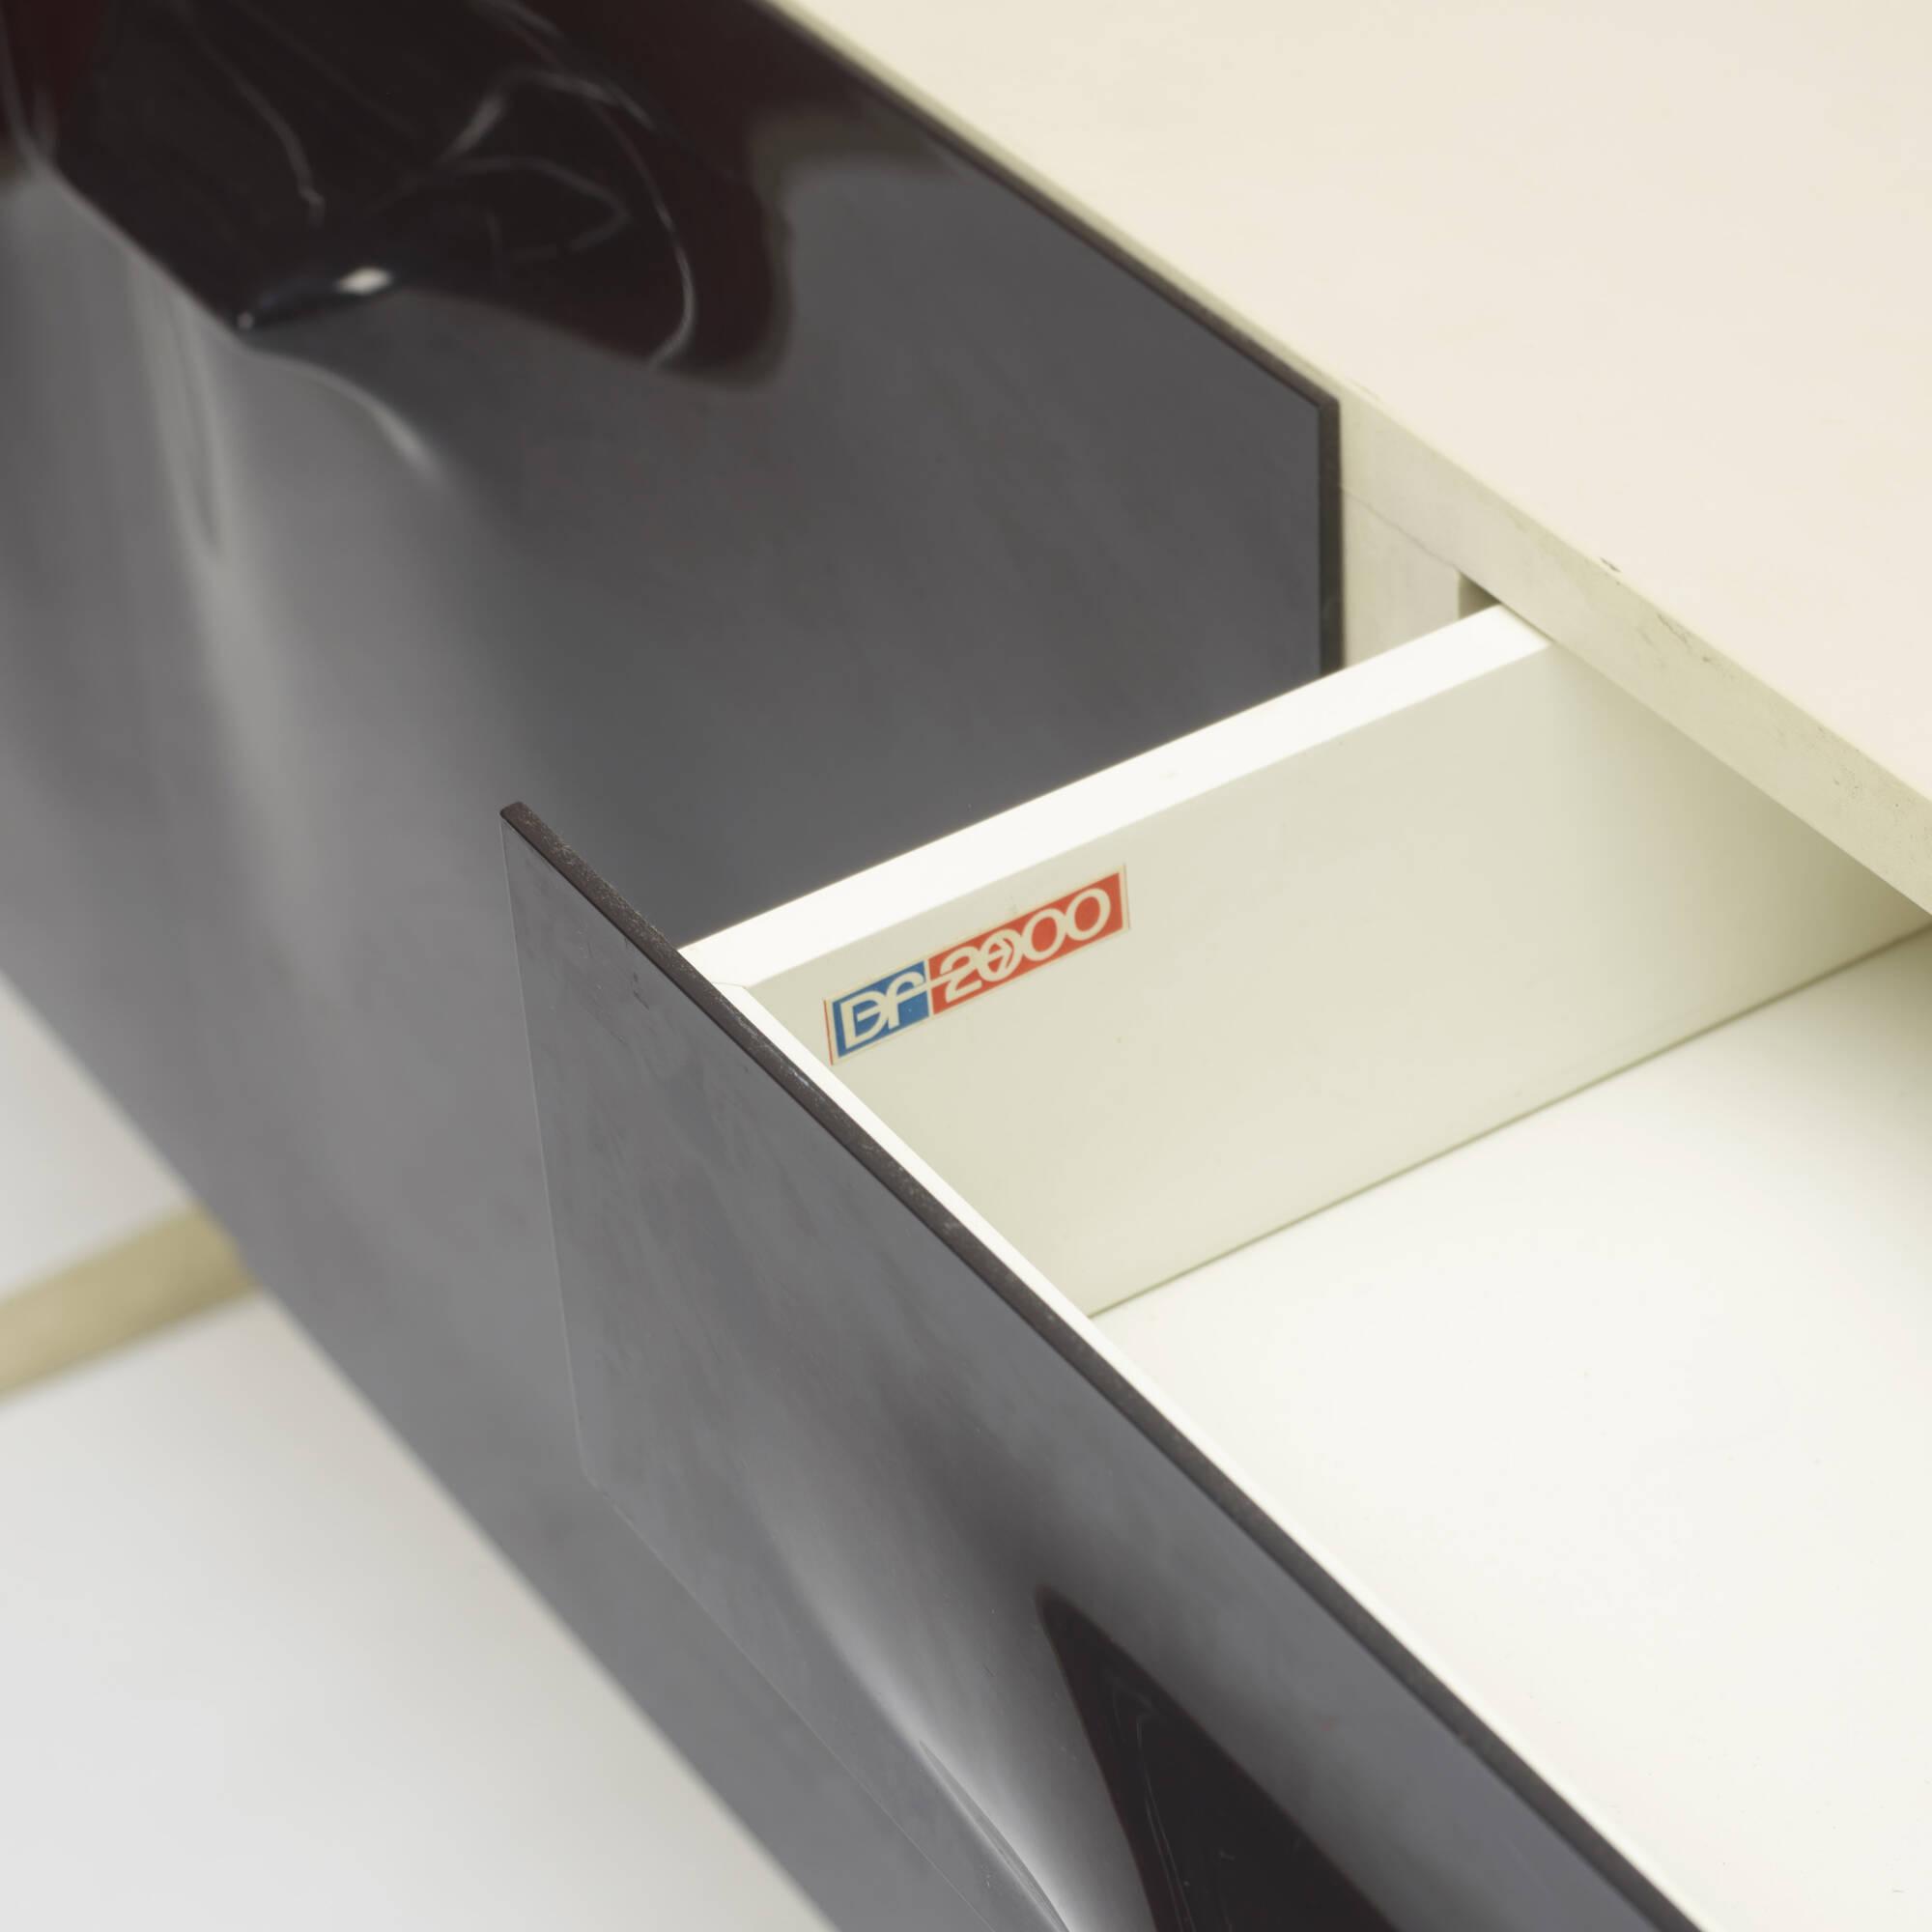 323: Raymond Loewy / DF 2000 cabinet (3 of 3)